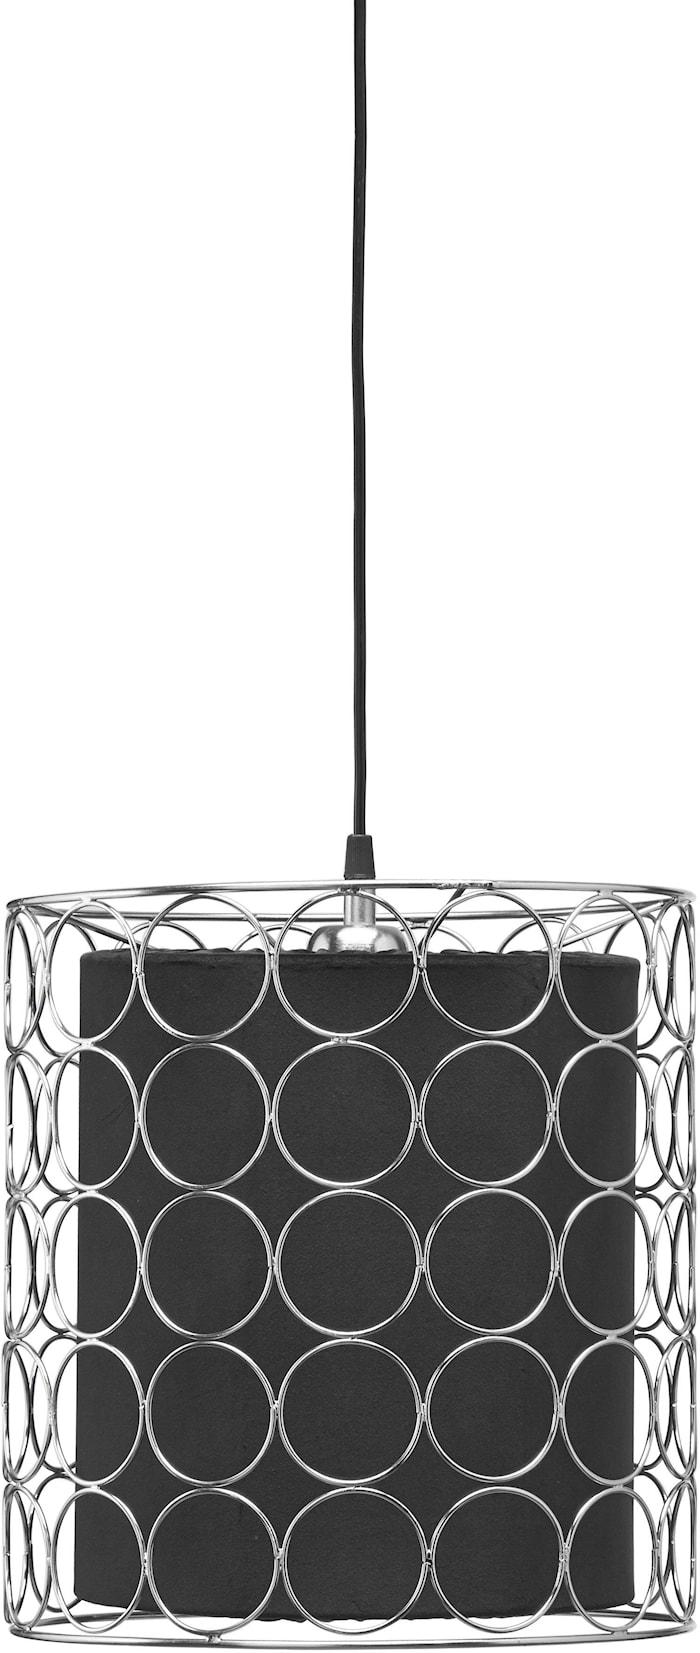 Ring Taklampa 30cm Krom/Svart